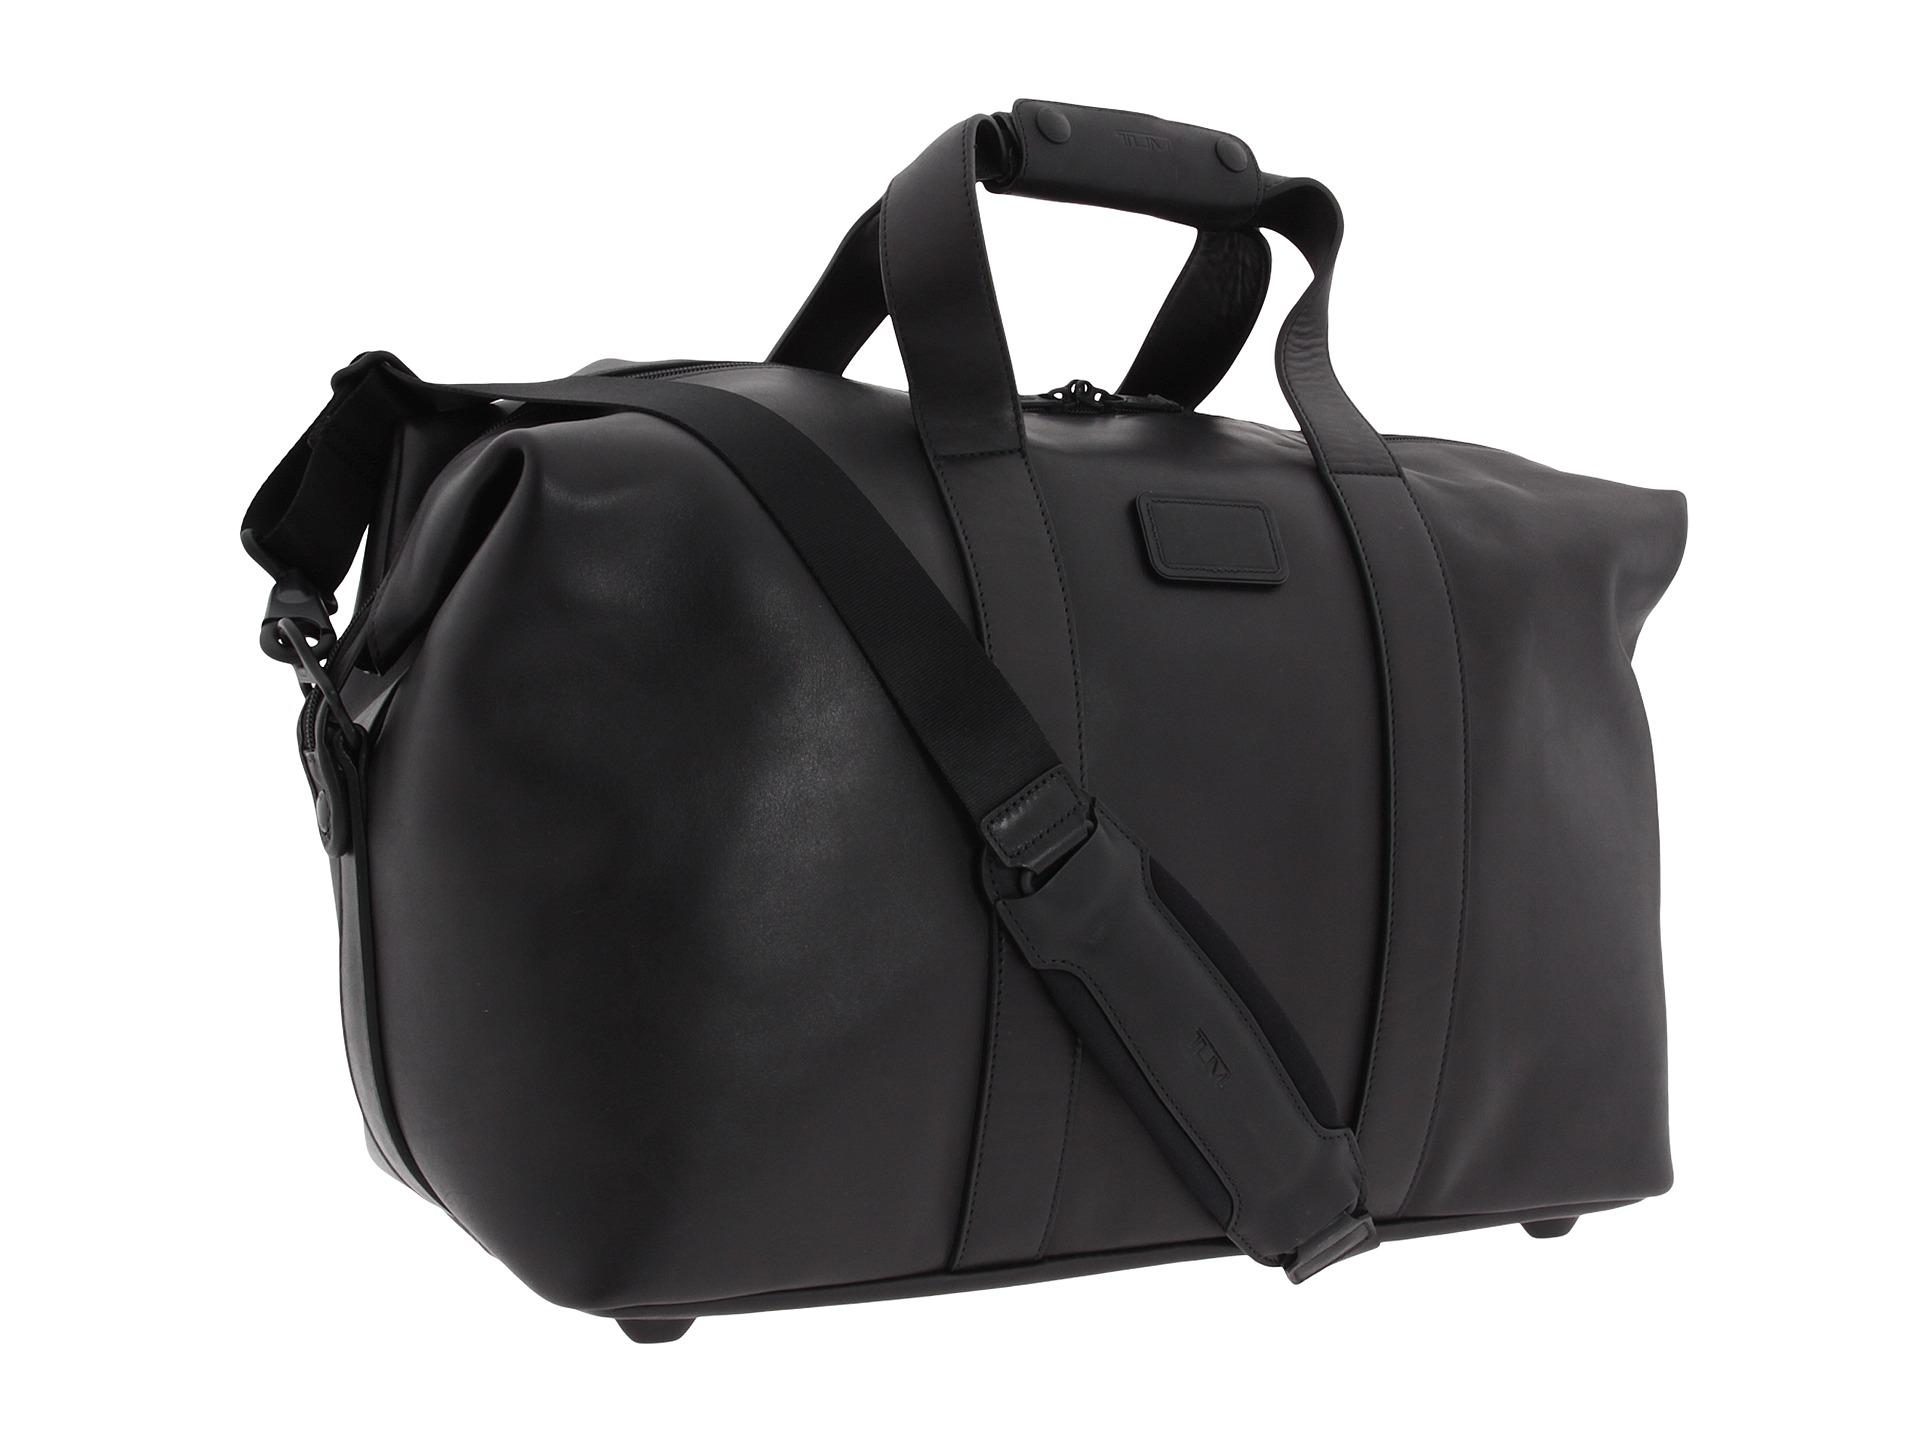 Lyst - Tumi Alpha - Small Soft Leather Travel Satchel in Black 673f4b308ab6d